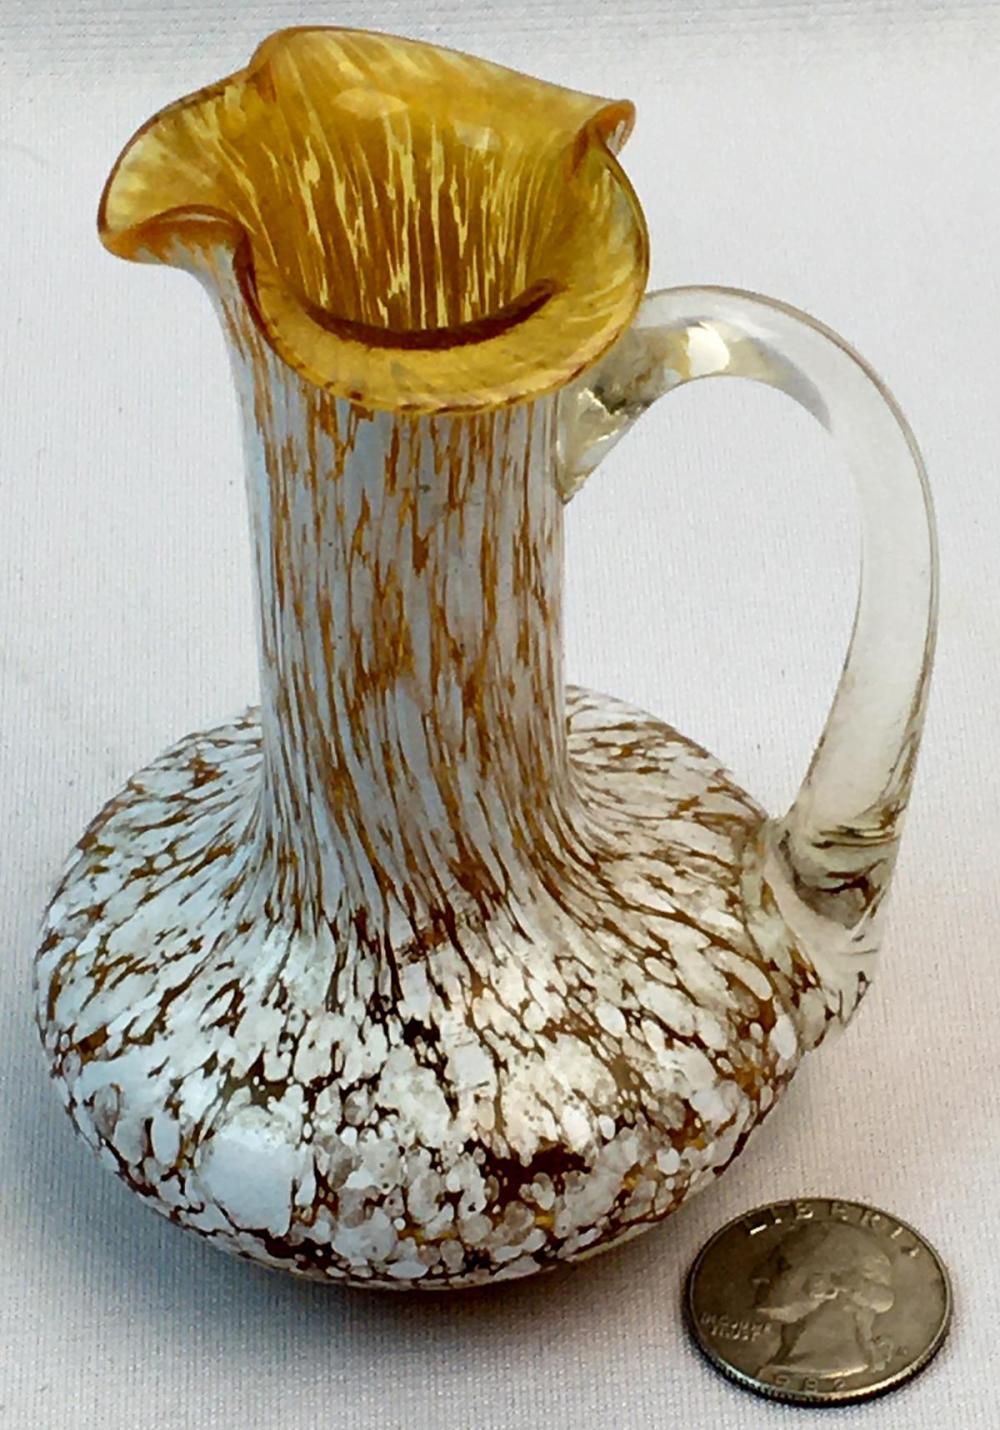 Vintage Amber & White Speckled Stretched Handblown Vase w/ Applied Handle